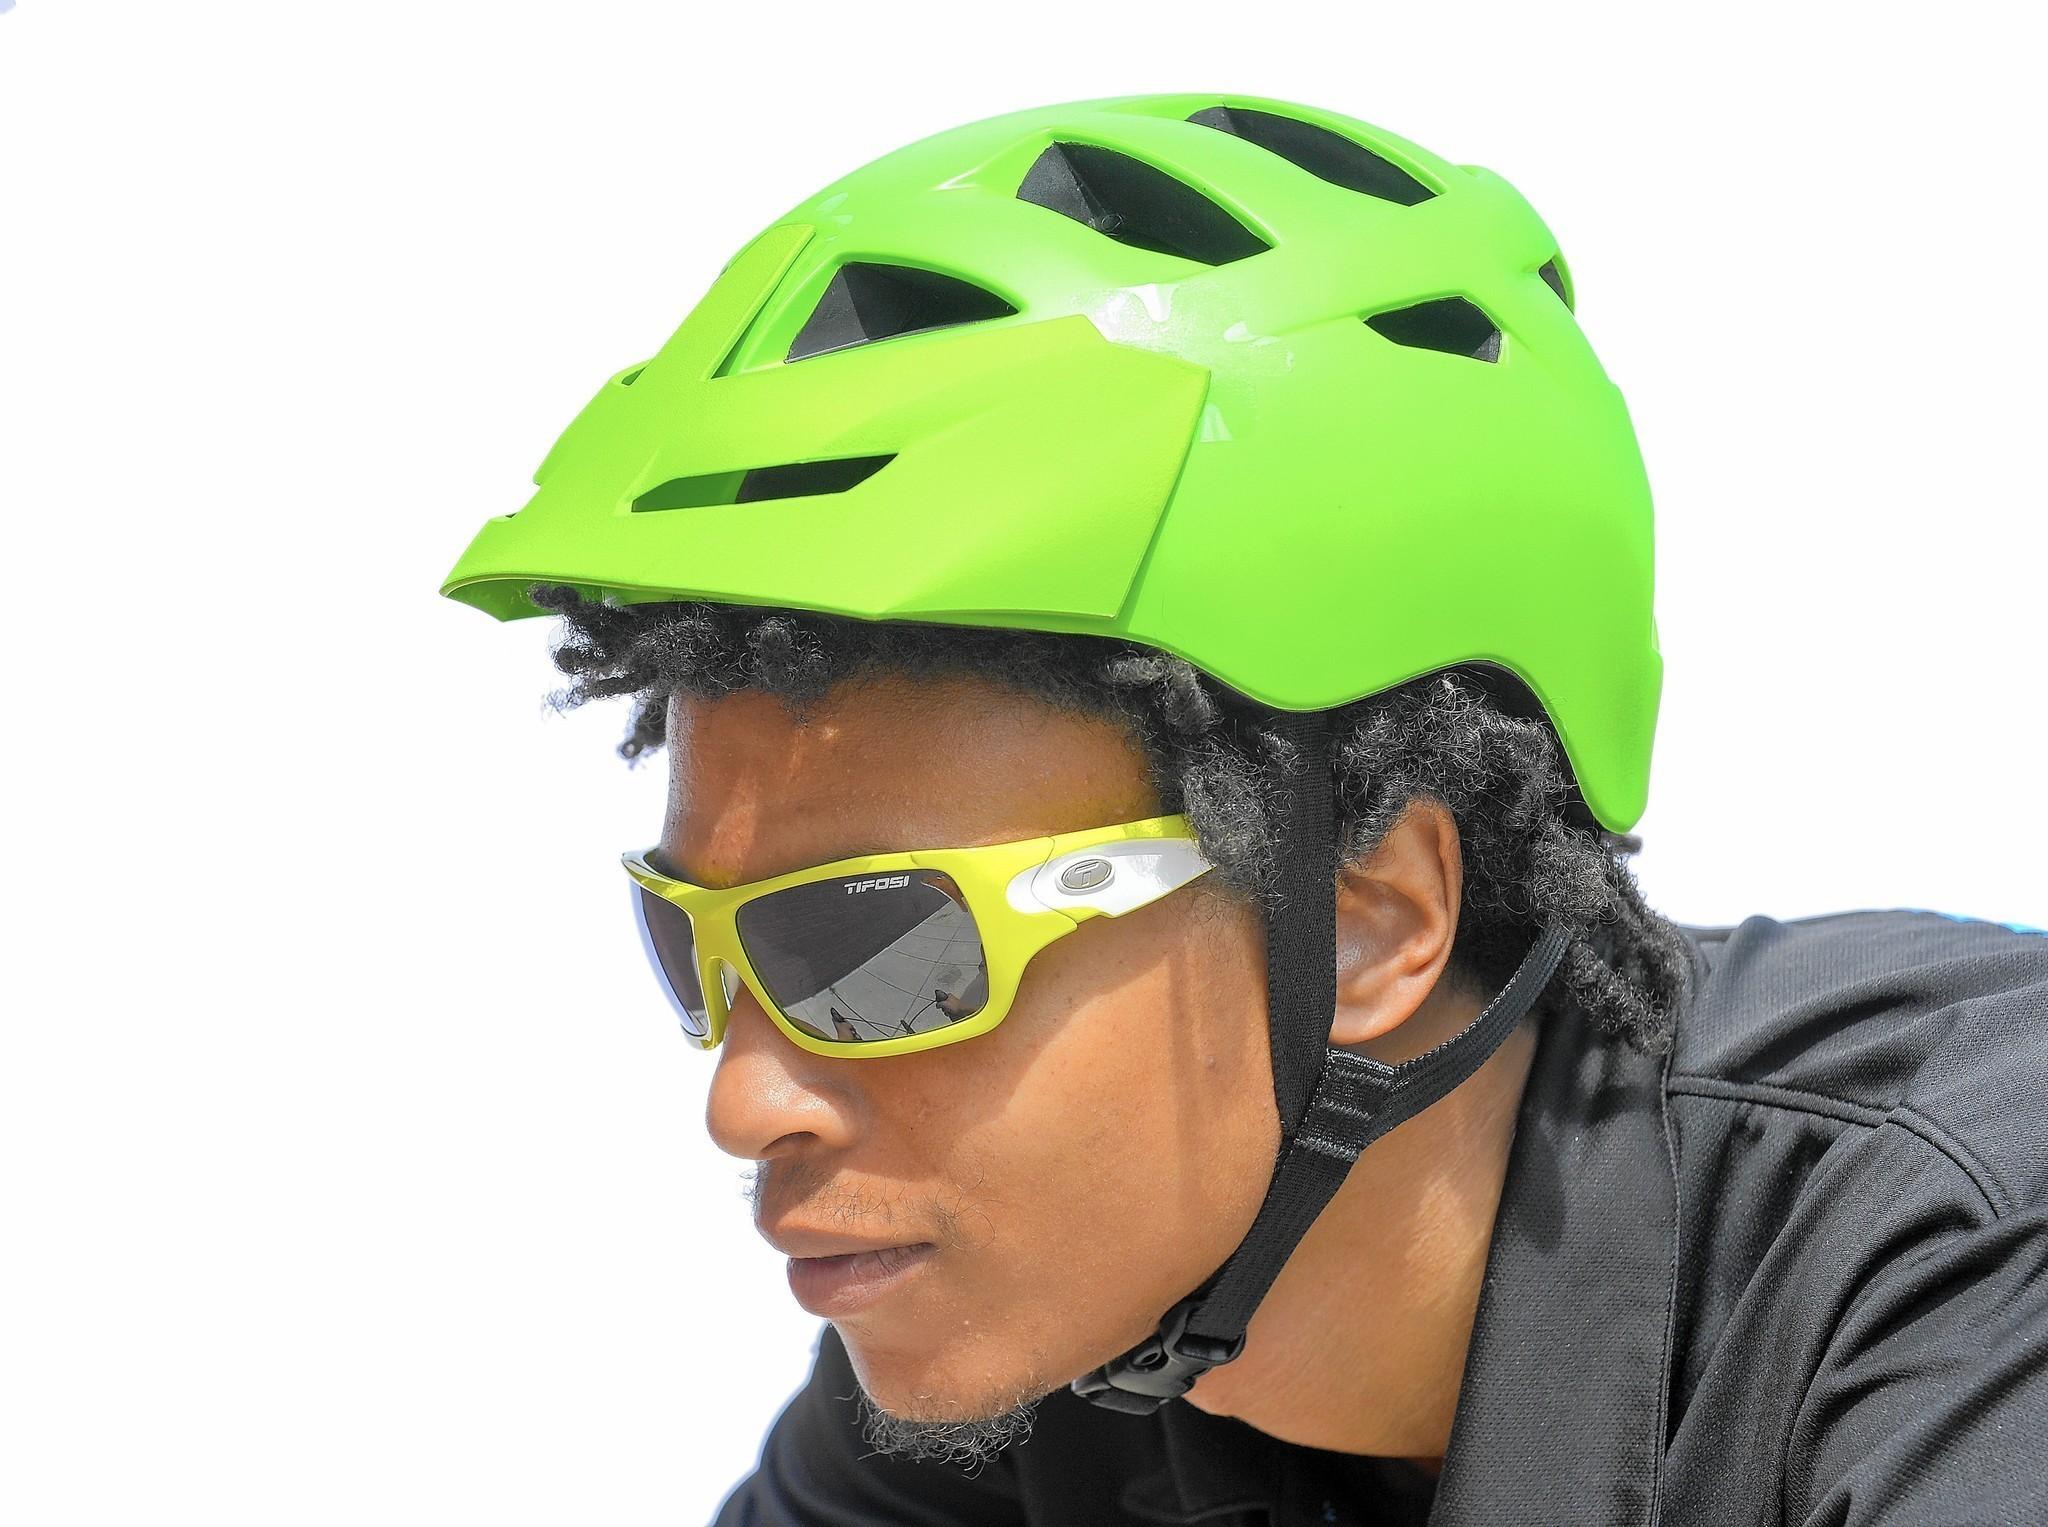 Bike Helmets Now More Fashionable And High Tech